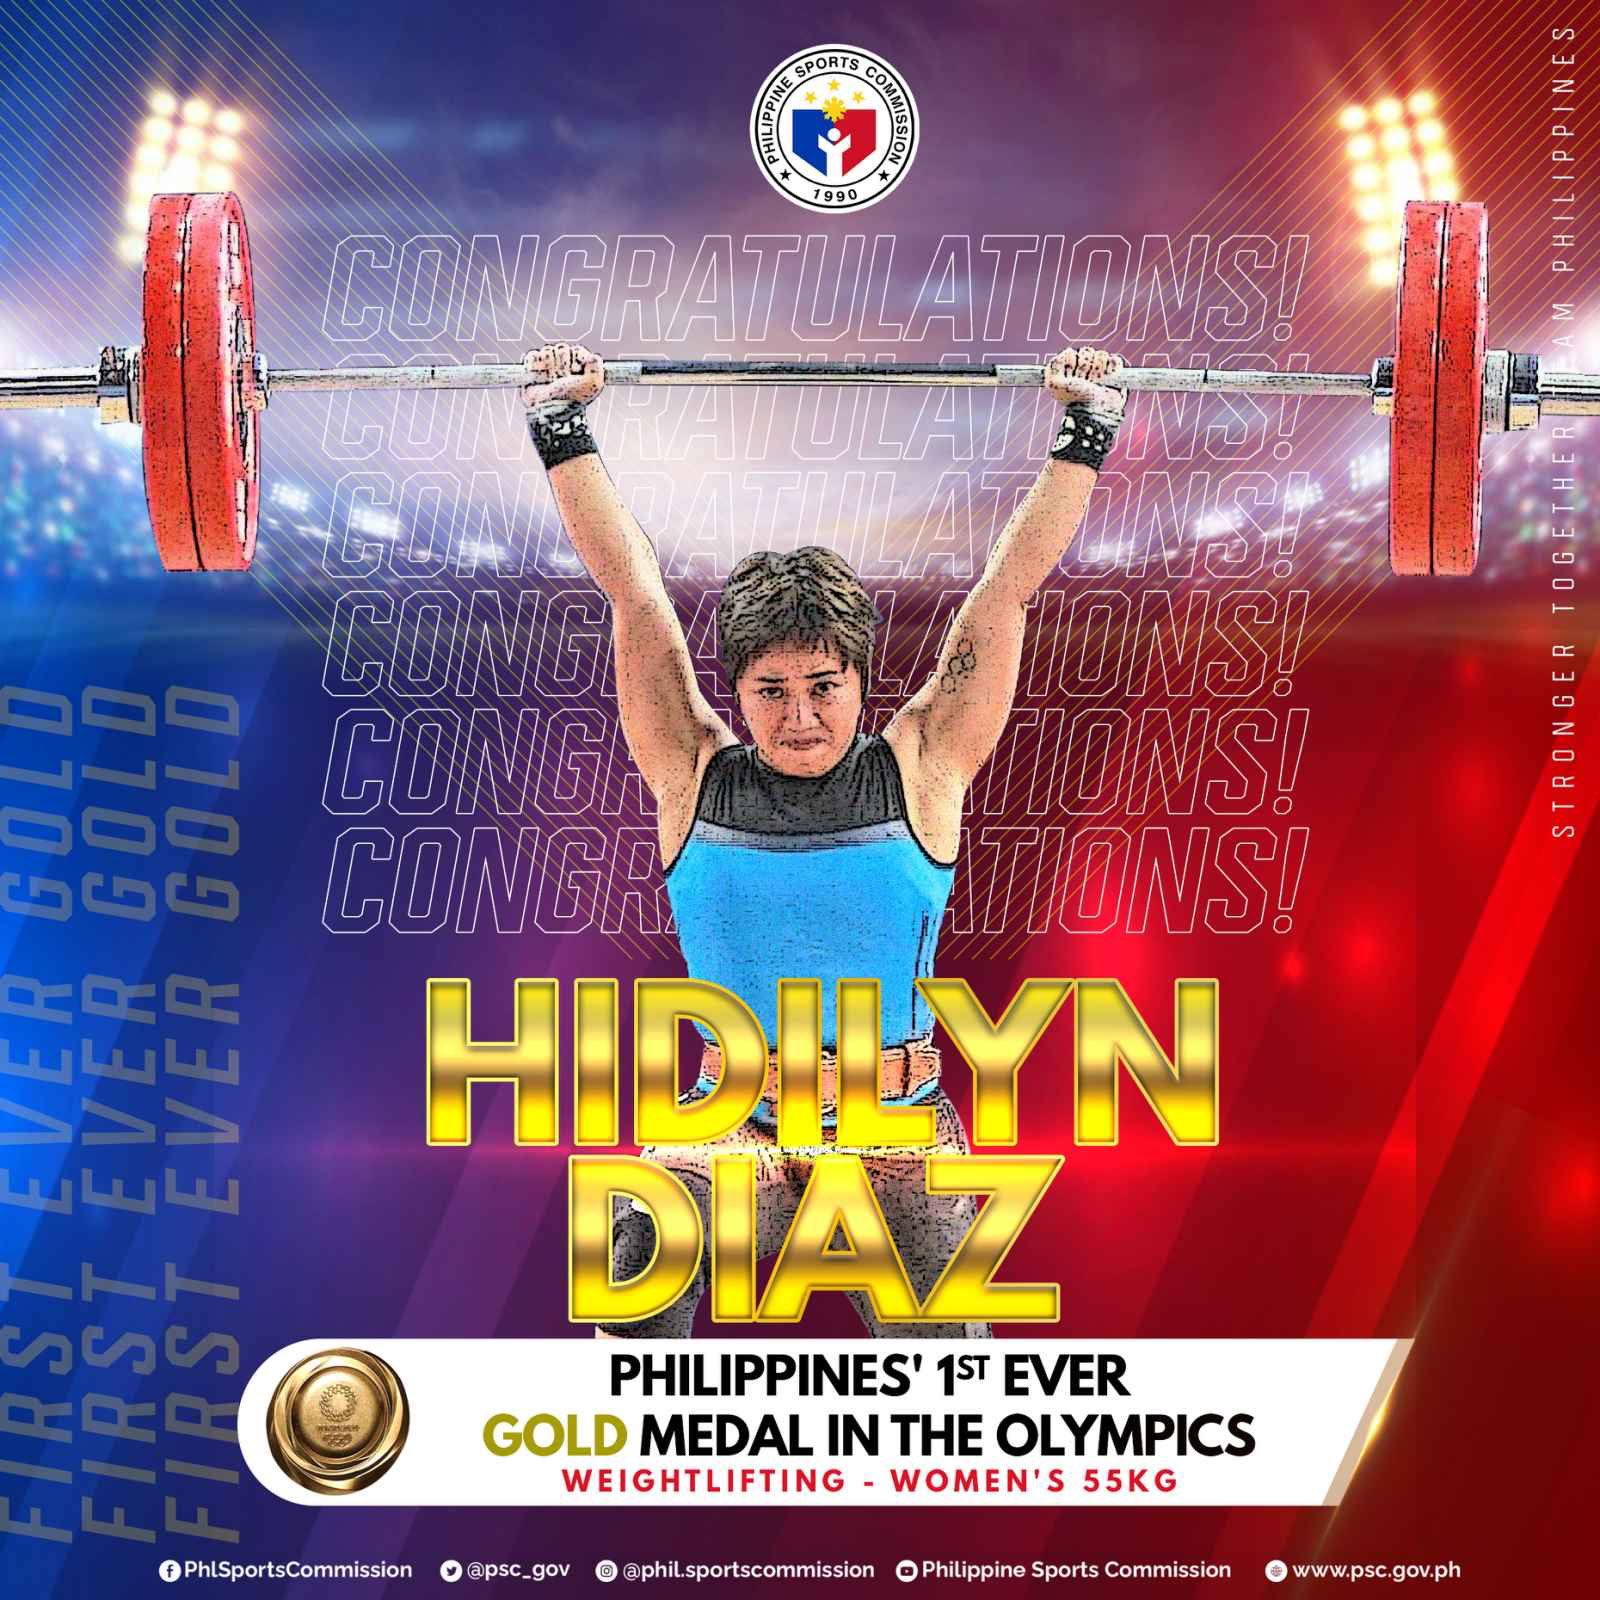 Hidilyn Diaz wins PH's first-ever Olympics gold